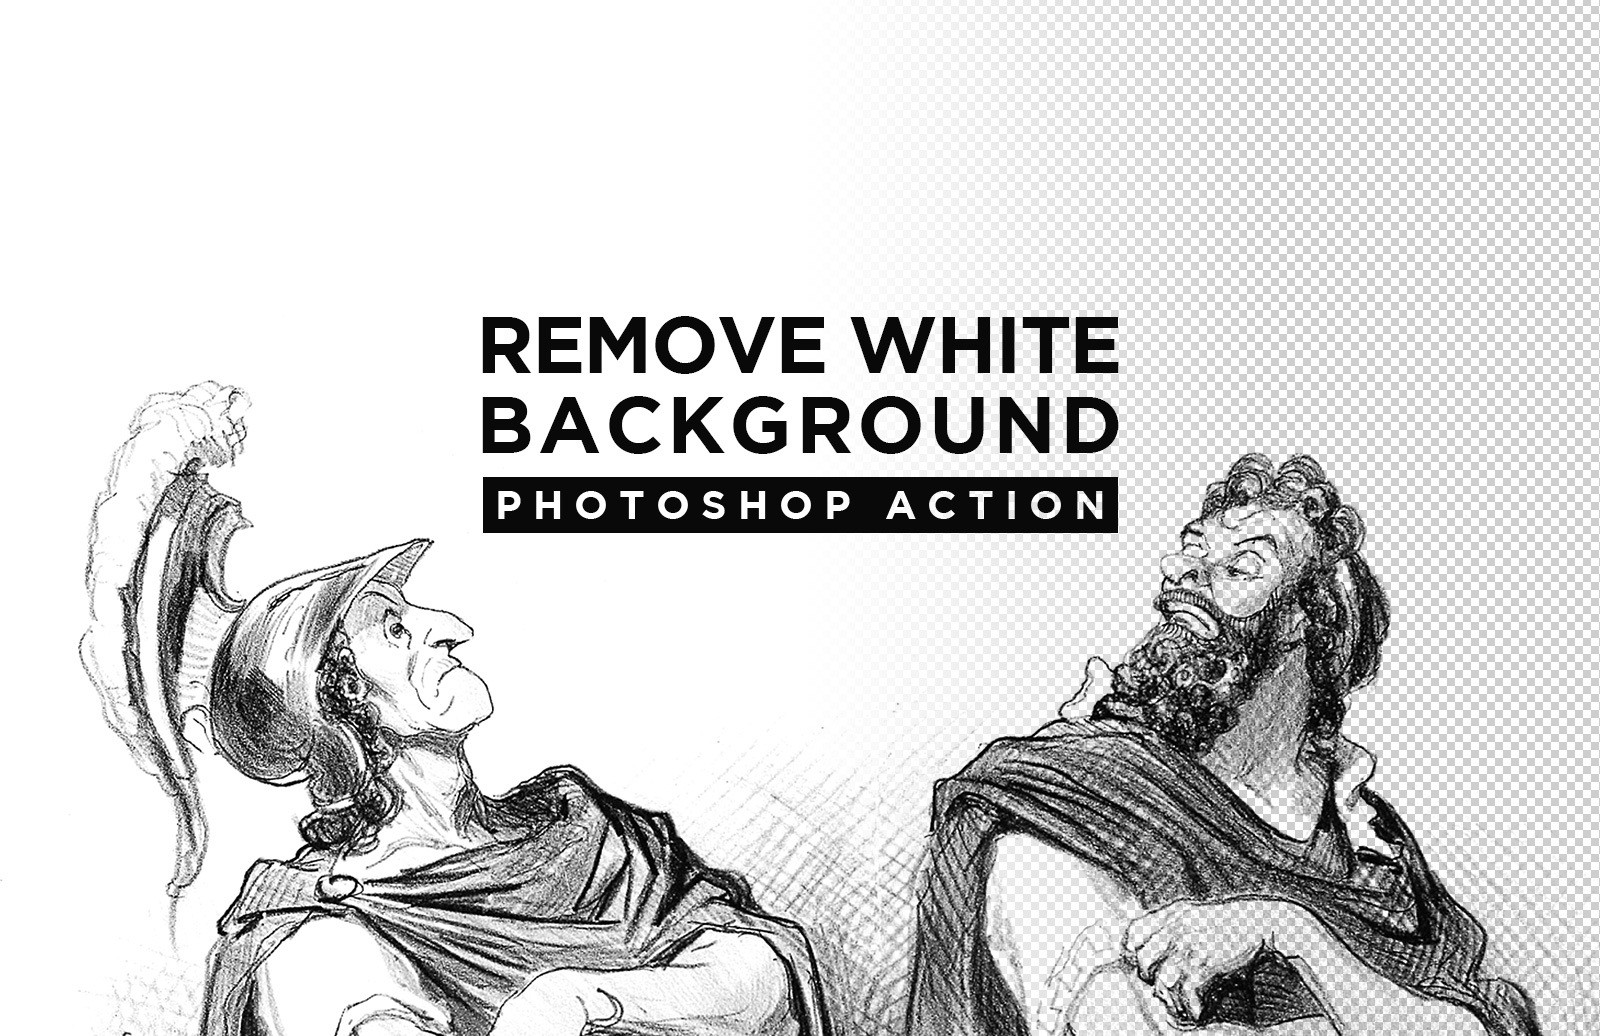 Remove White Background Photoshop Action